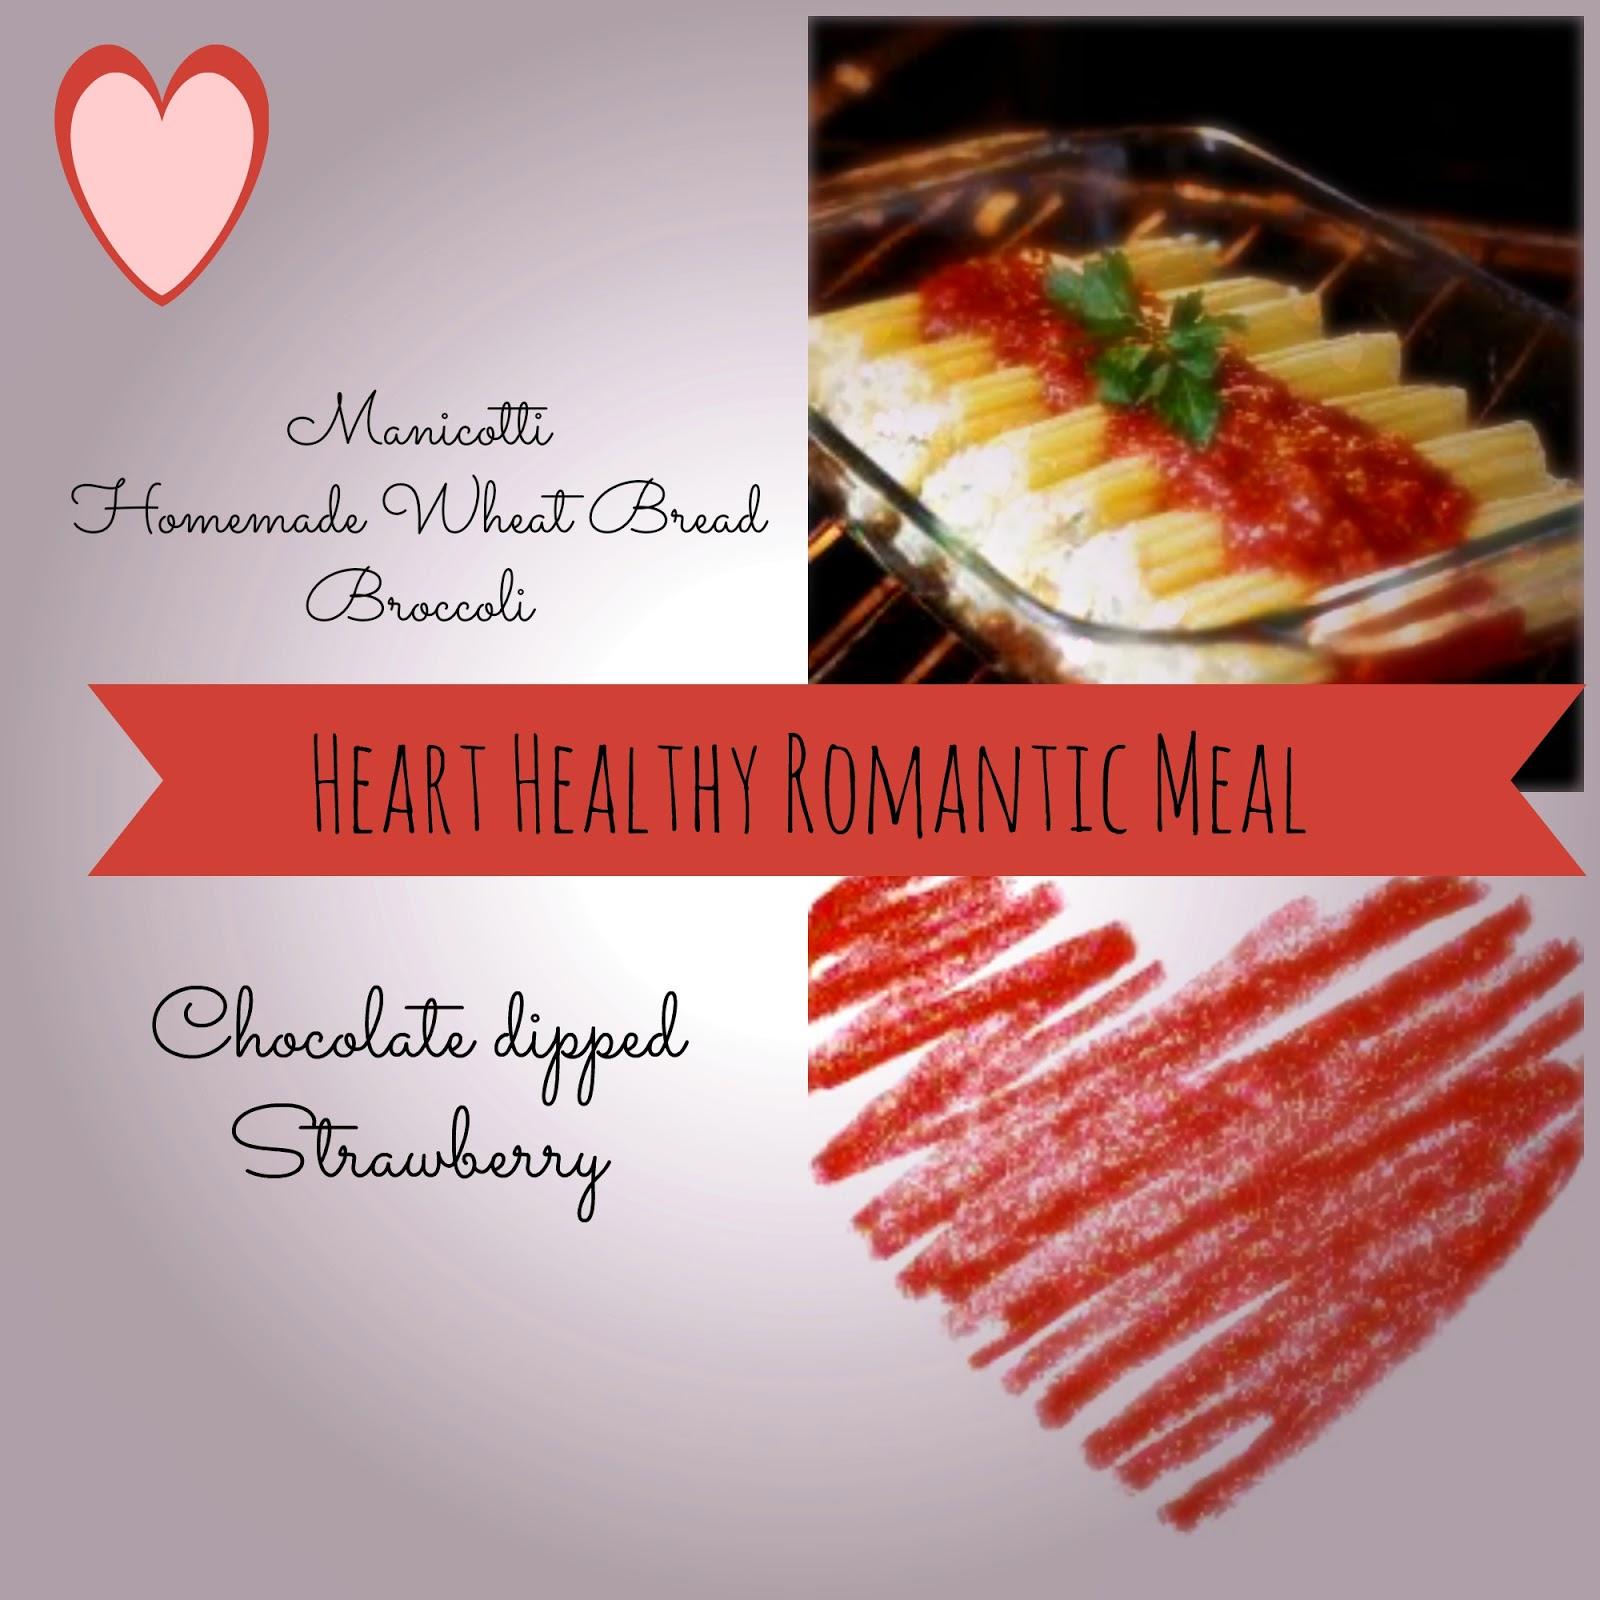 Valentine's Day, Manicotti, Homemade wheat bread, broccoli, chocolate dipped strawberries